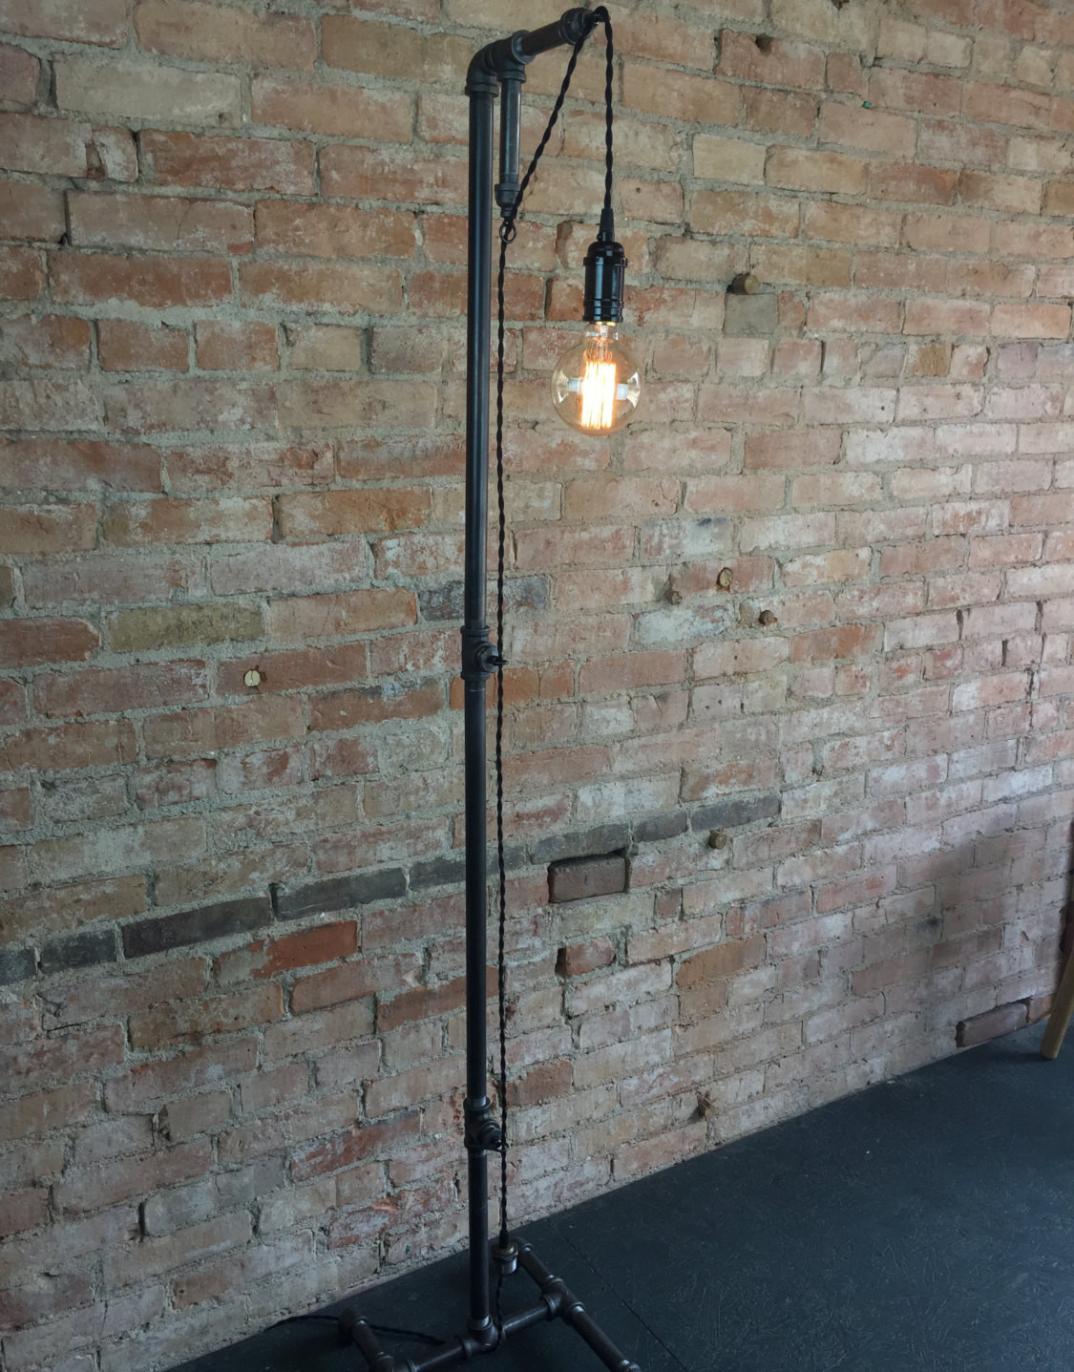 Lampade-applique-stile-industrial-bottiglie-vetro-tubi-metallo-18 ...